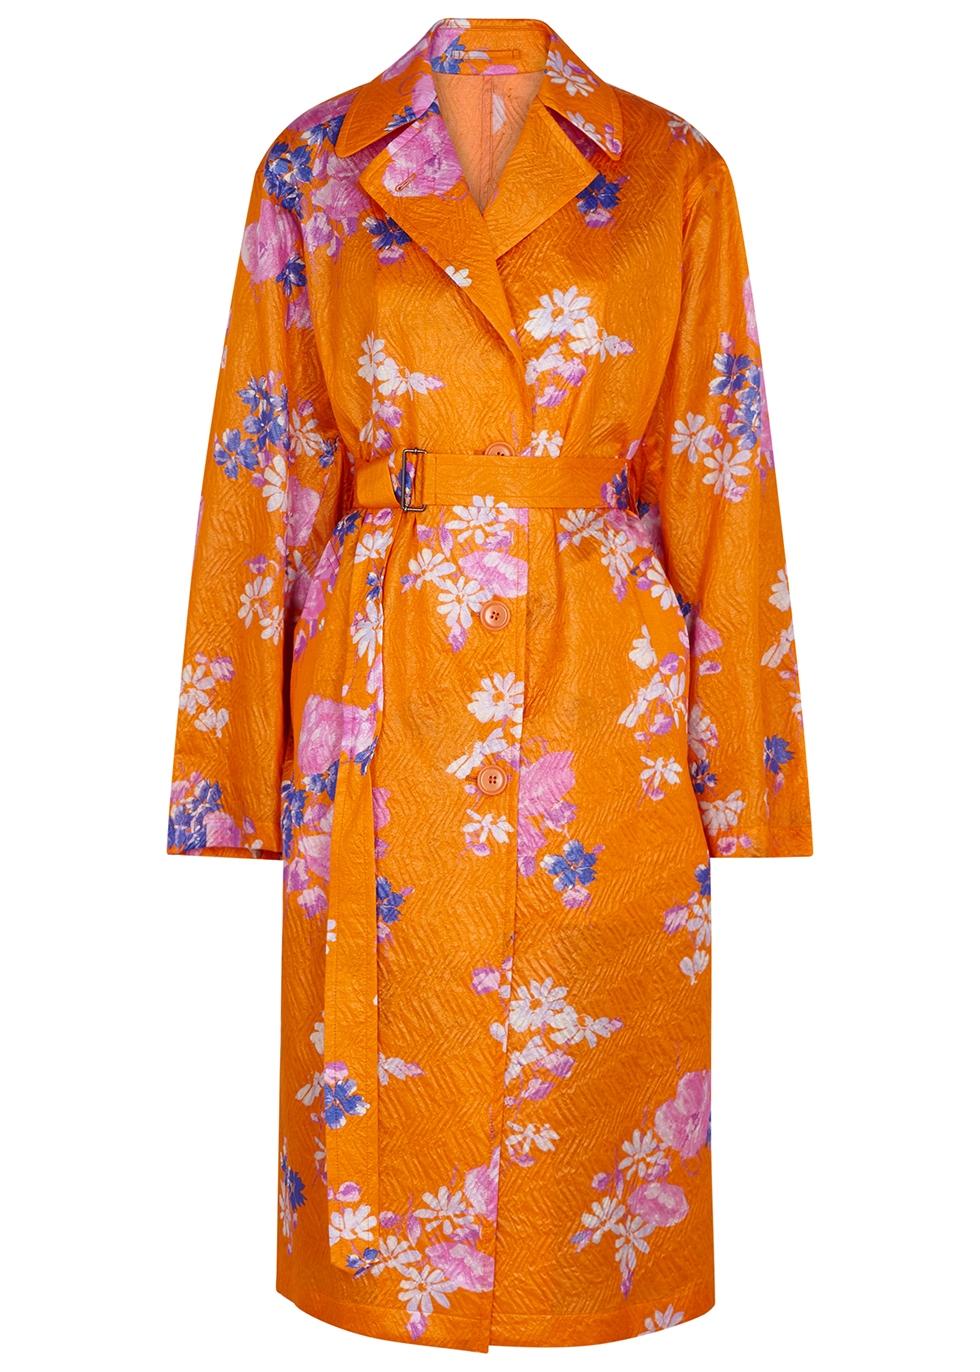 Rubor printed silk-blend cloqué jacket - Dries Van Noten